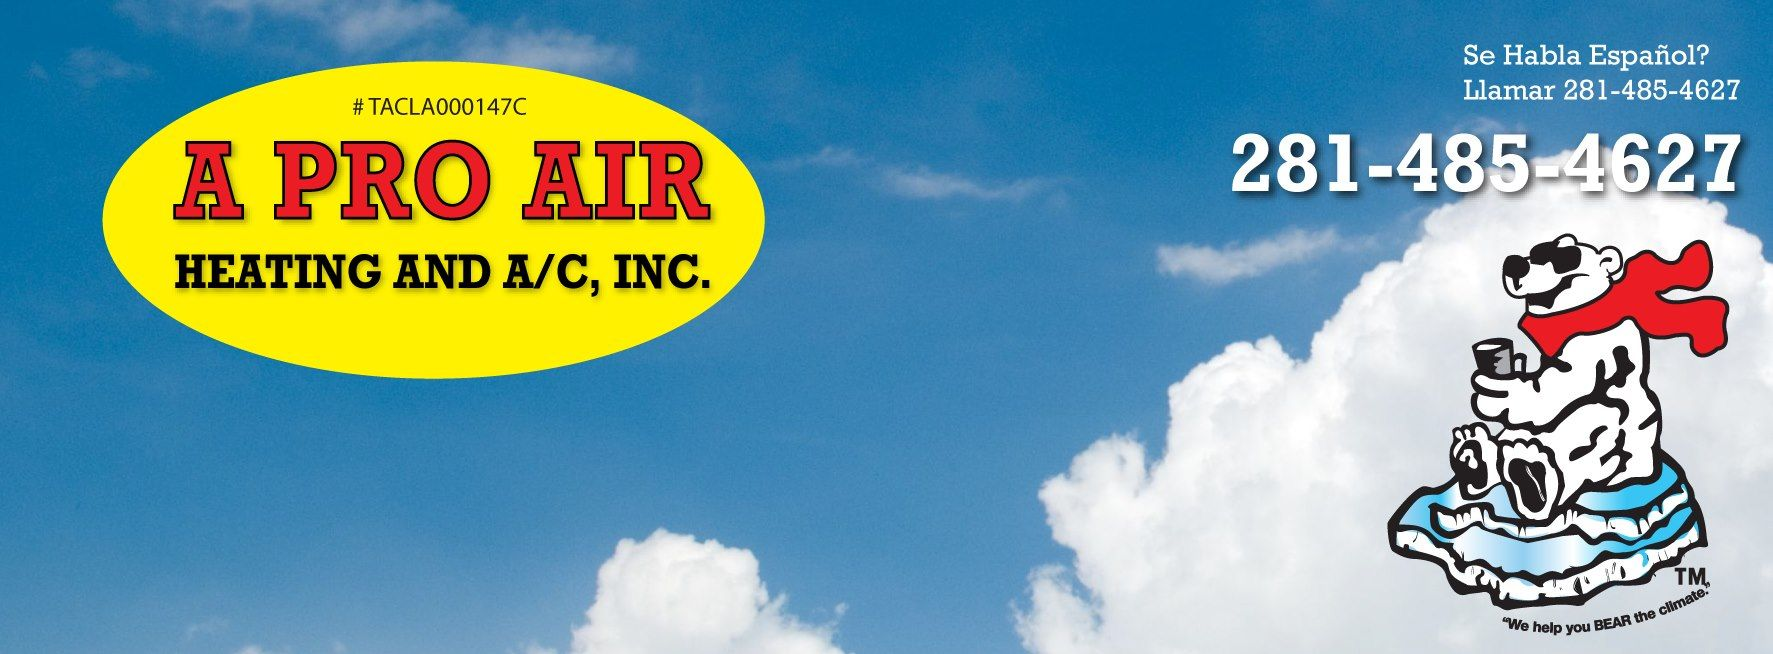 24 Hour AC Repair Sarasota Sarasota, Air conditioning